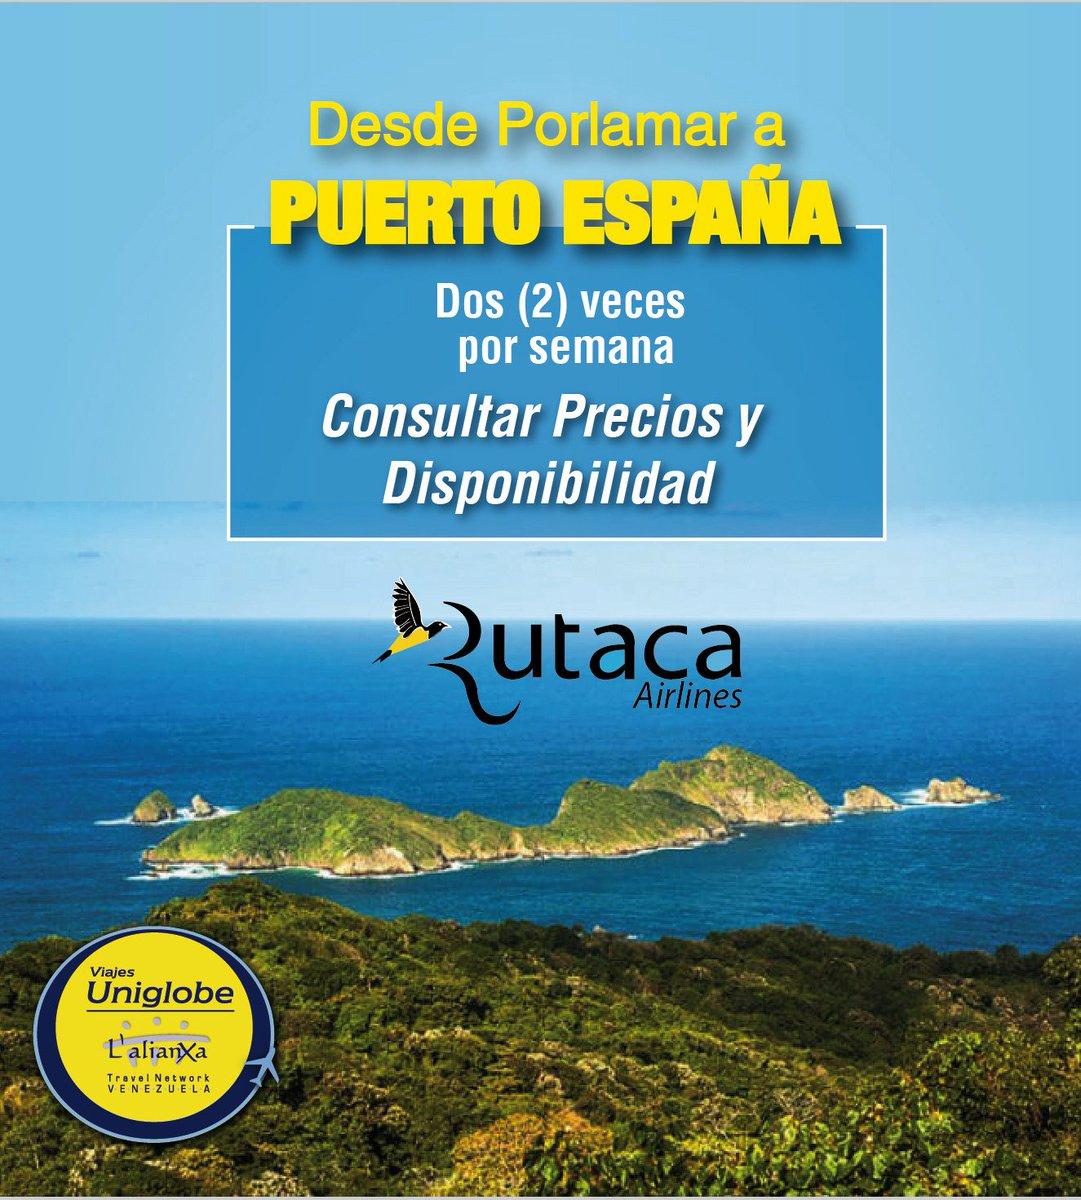 #Puertoespaña con con @rutaca #viajesuniglobe #somosuniglobe #turismo #travel #visiting  #like #f4f #instapohoto pic.twitter.com/qHJNFfMRbT